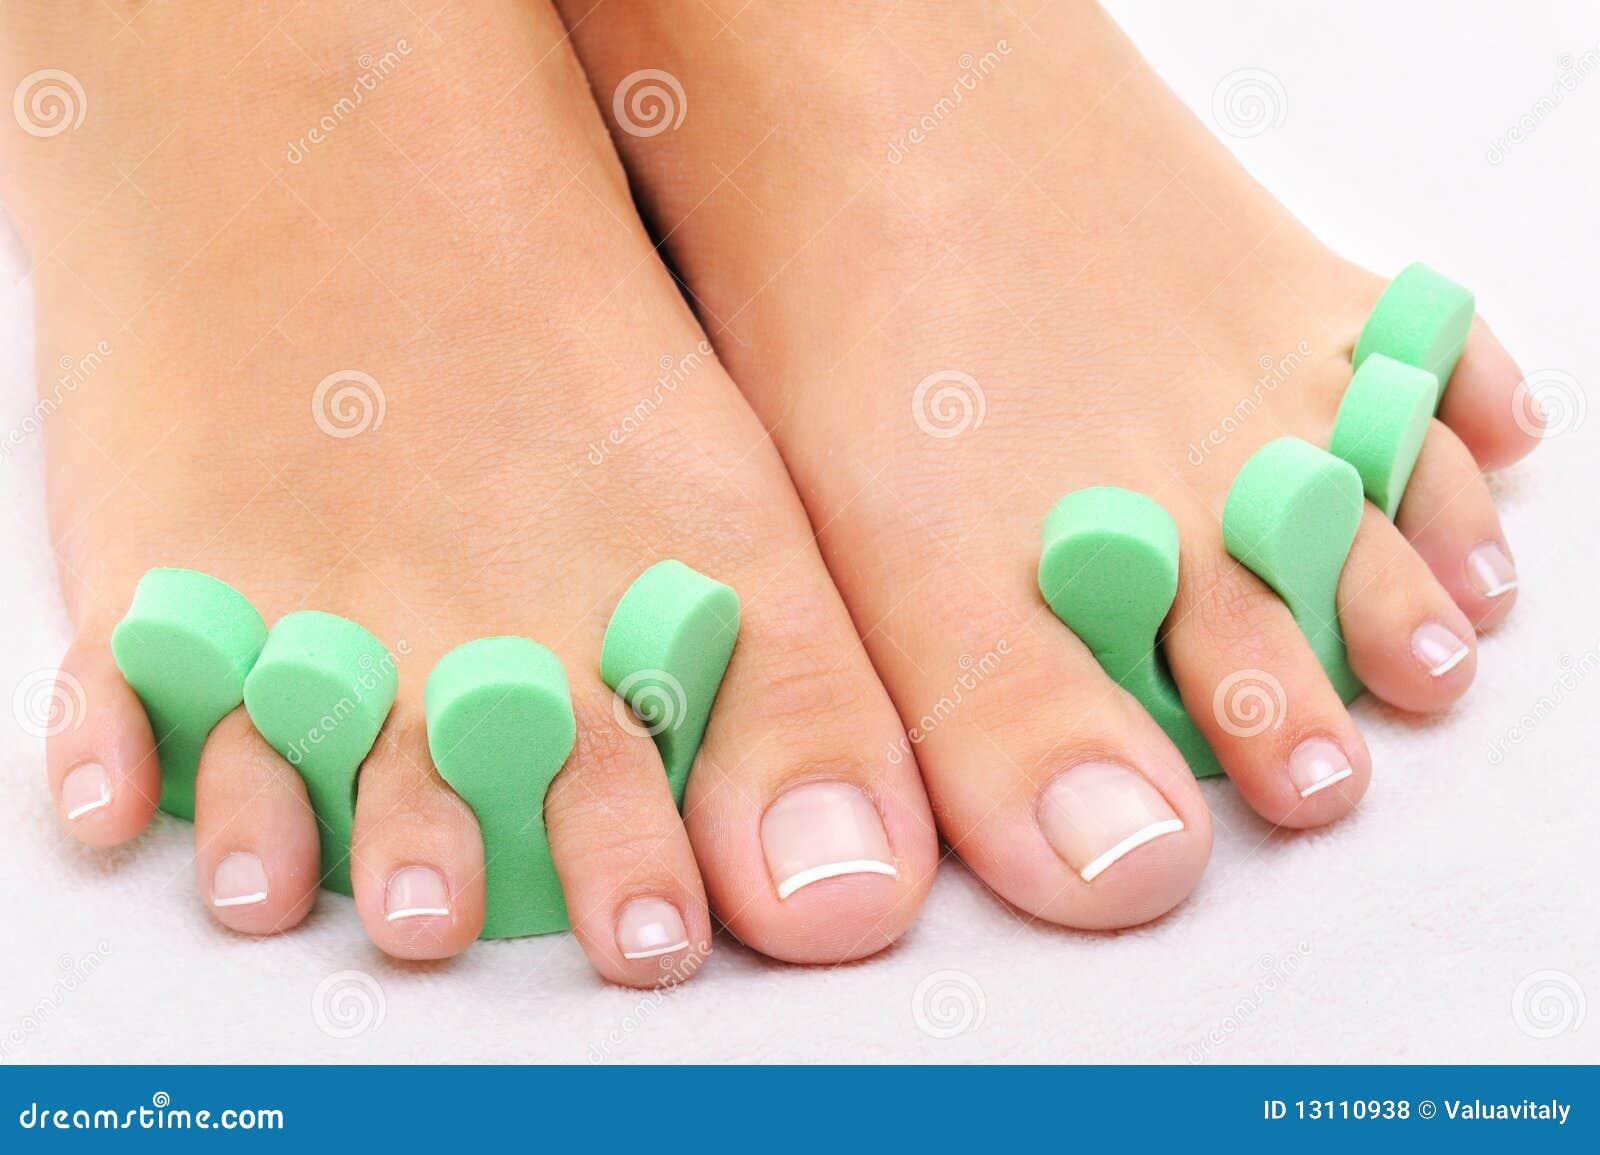 beauty treatment for feet